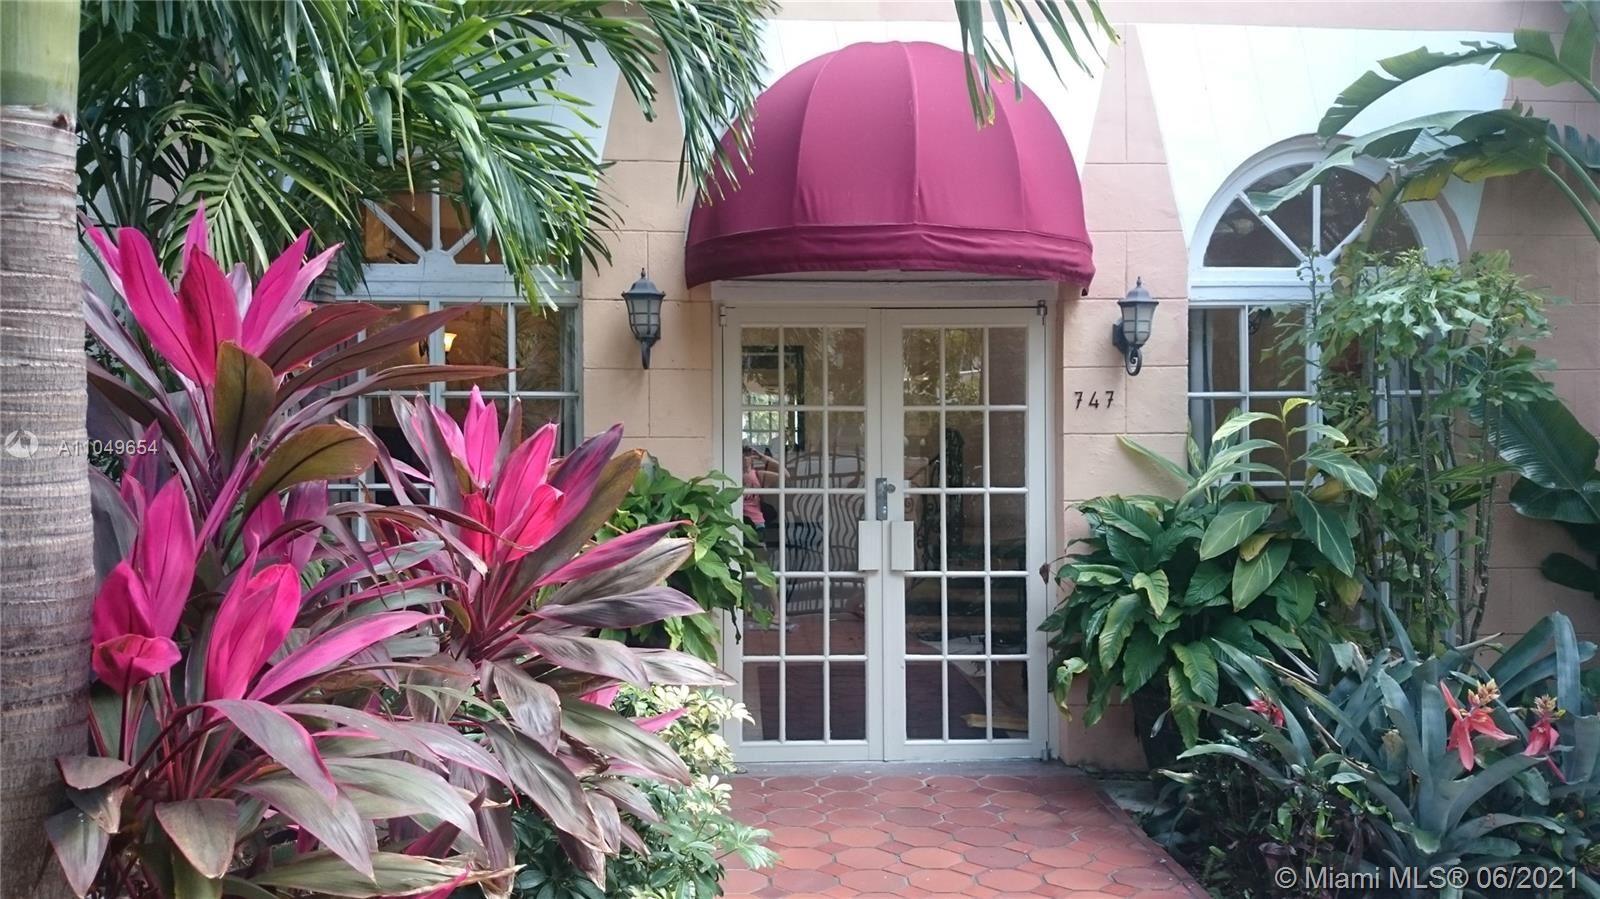 747 Michigan Ave #101, Miami Beach, FL 33139 - #: A11049654